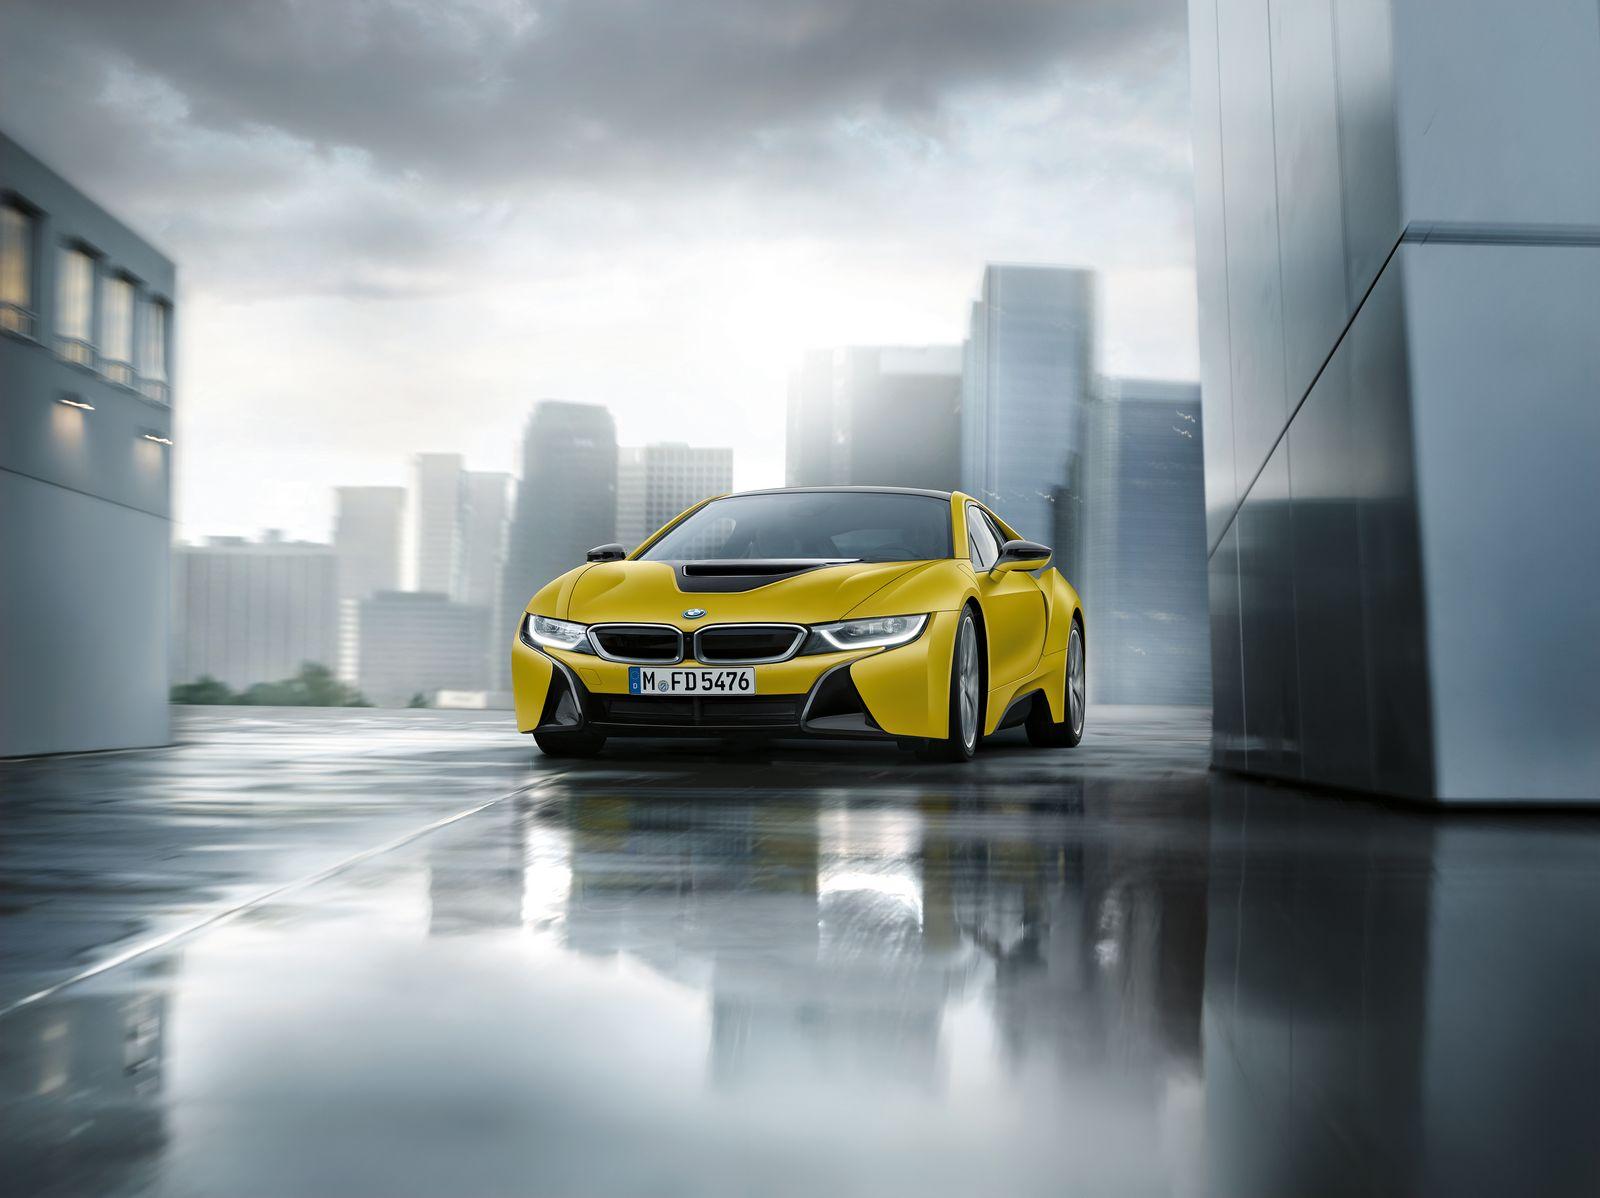 2013 - [BMW] i8 [i12] - Page 22 BMW%2Bi8%2BFrozen%2BYellow%2B5